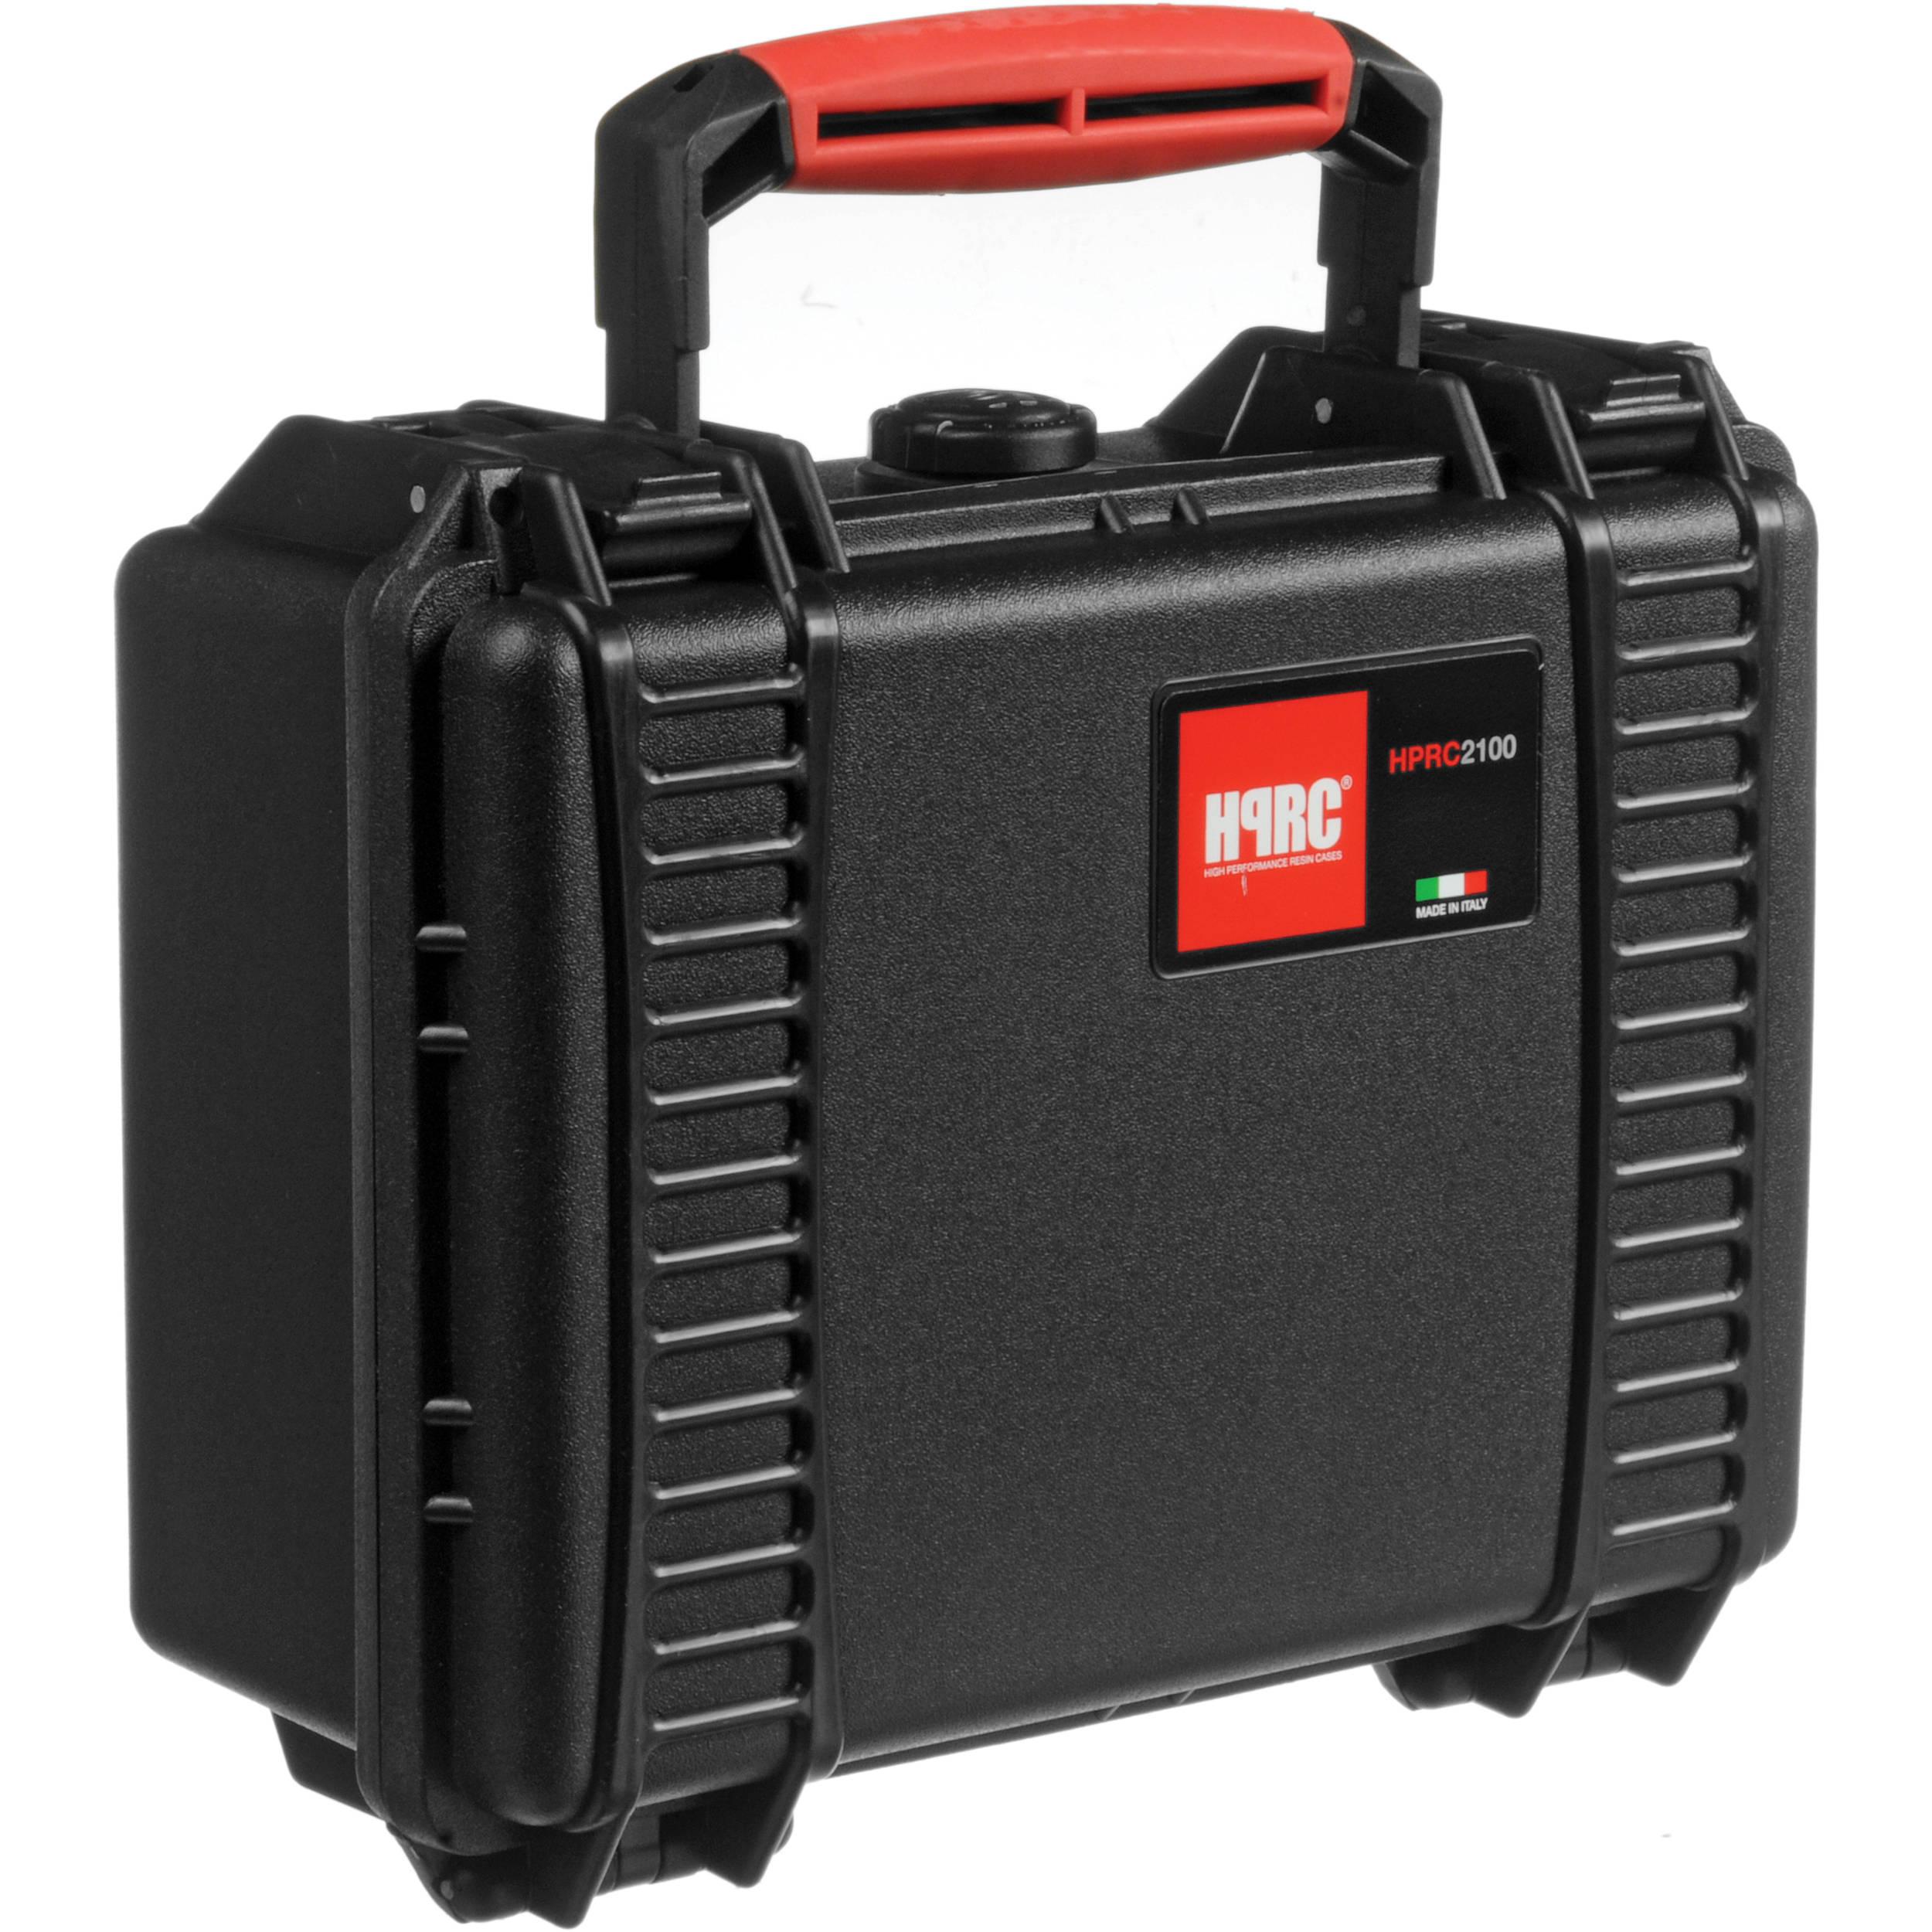 d9d04936975d HPRC 2100F HPRC Hard Case with Cubed Foam Interior (Black)